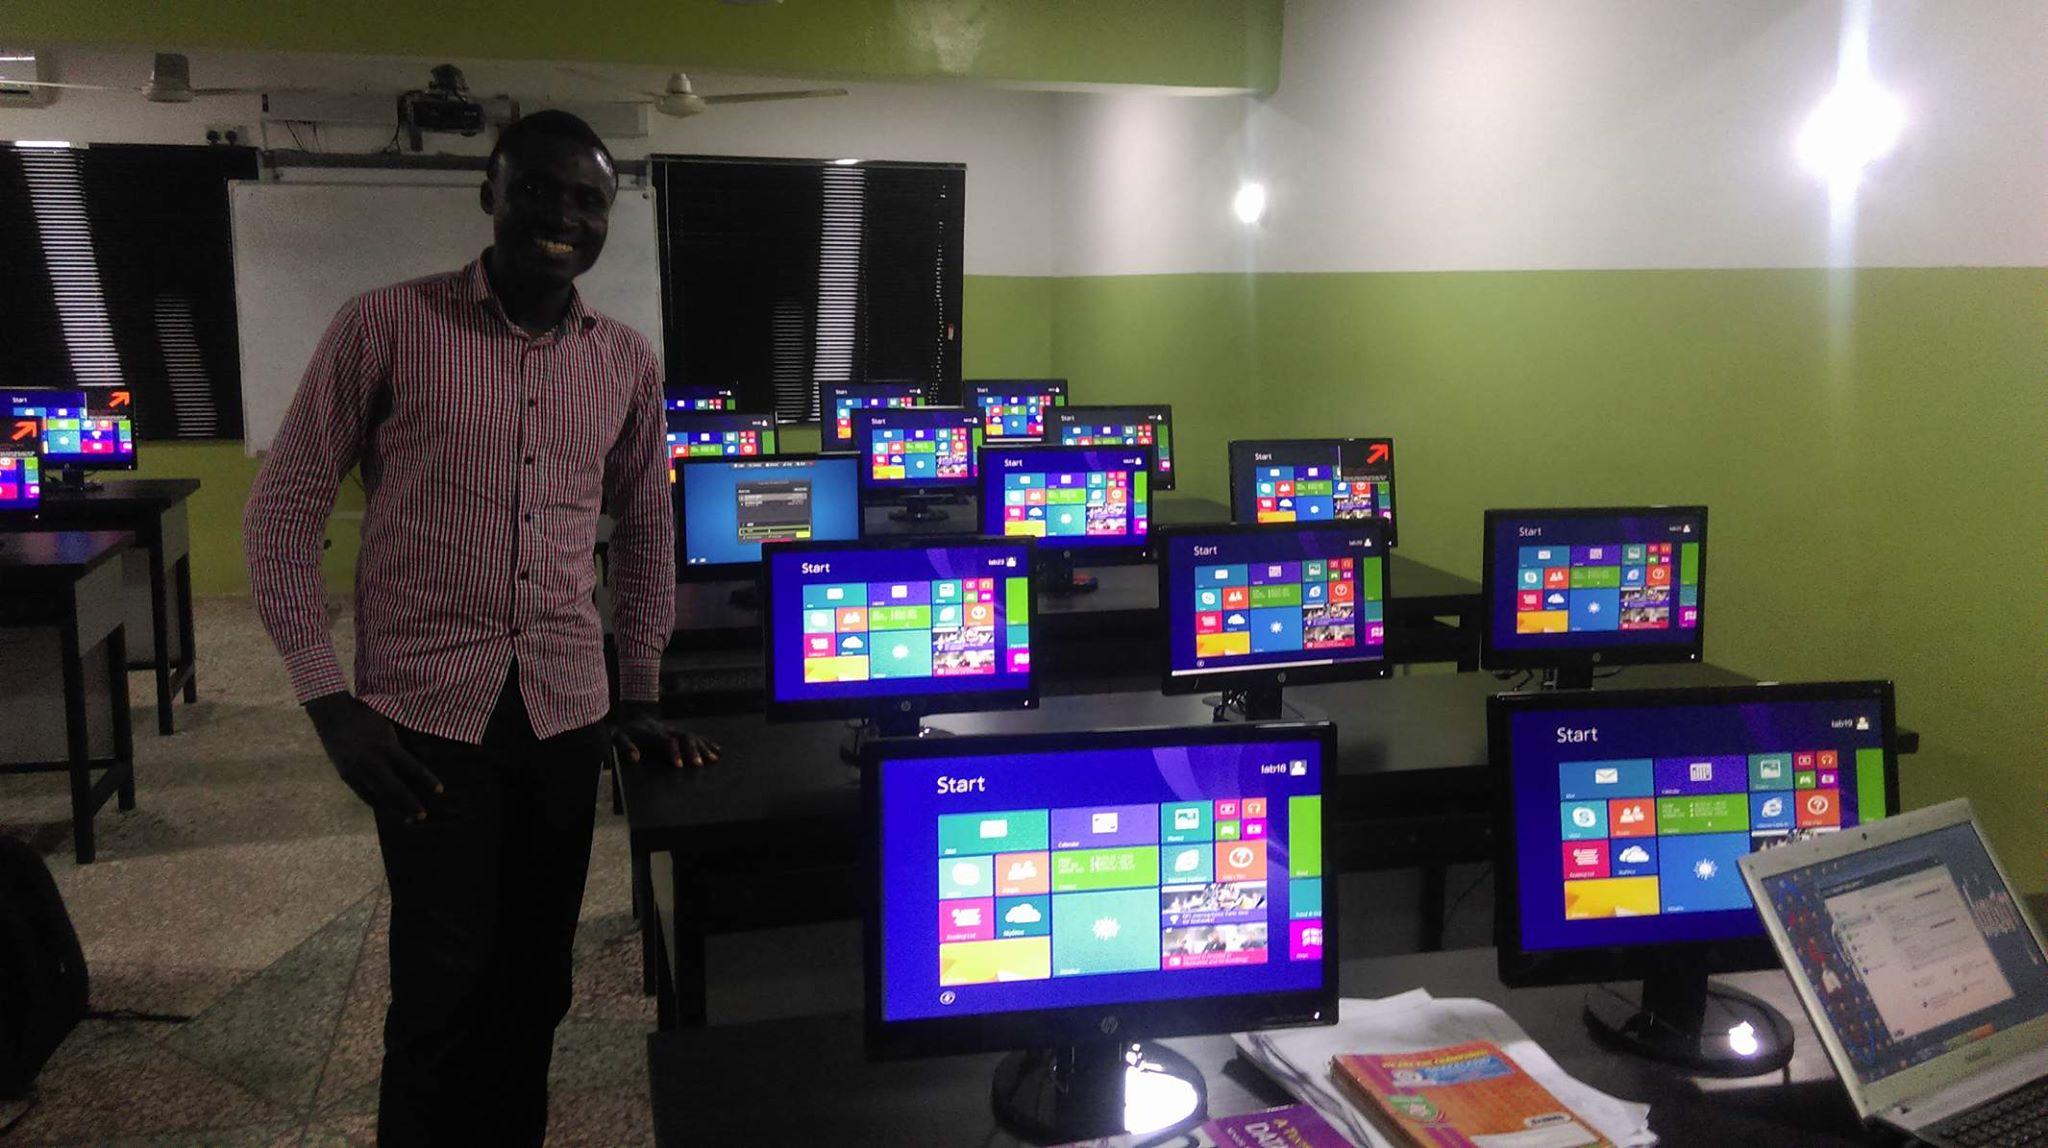 Graceland-International-School-in-Nigeria1.jpg